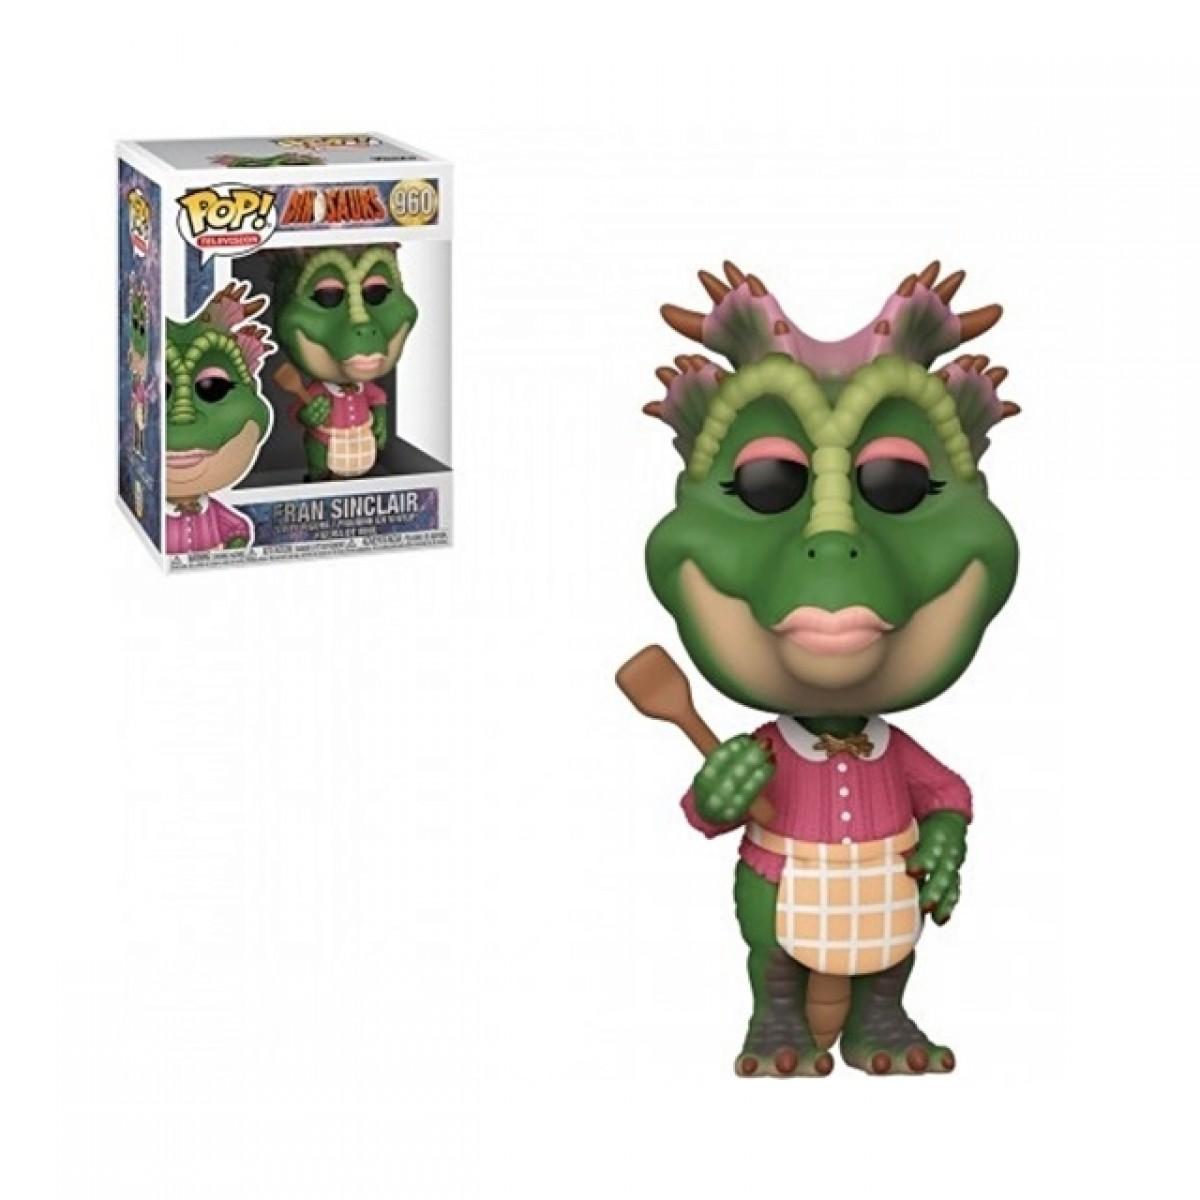 Funko POP! A Família Dinossauros, Fran Sinclair N 47008